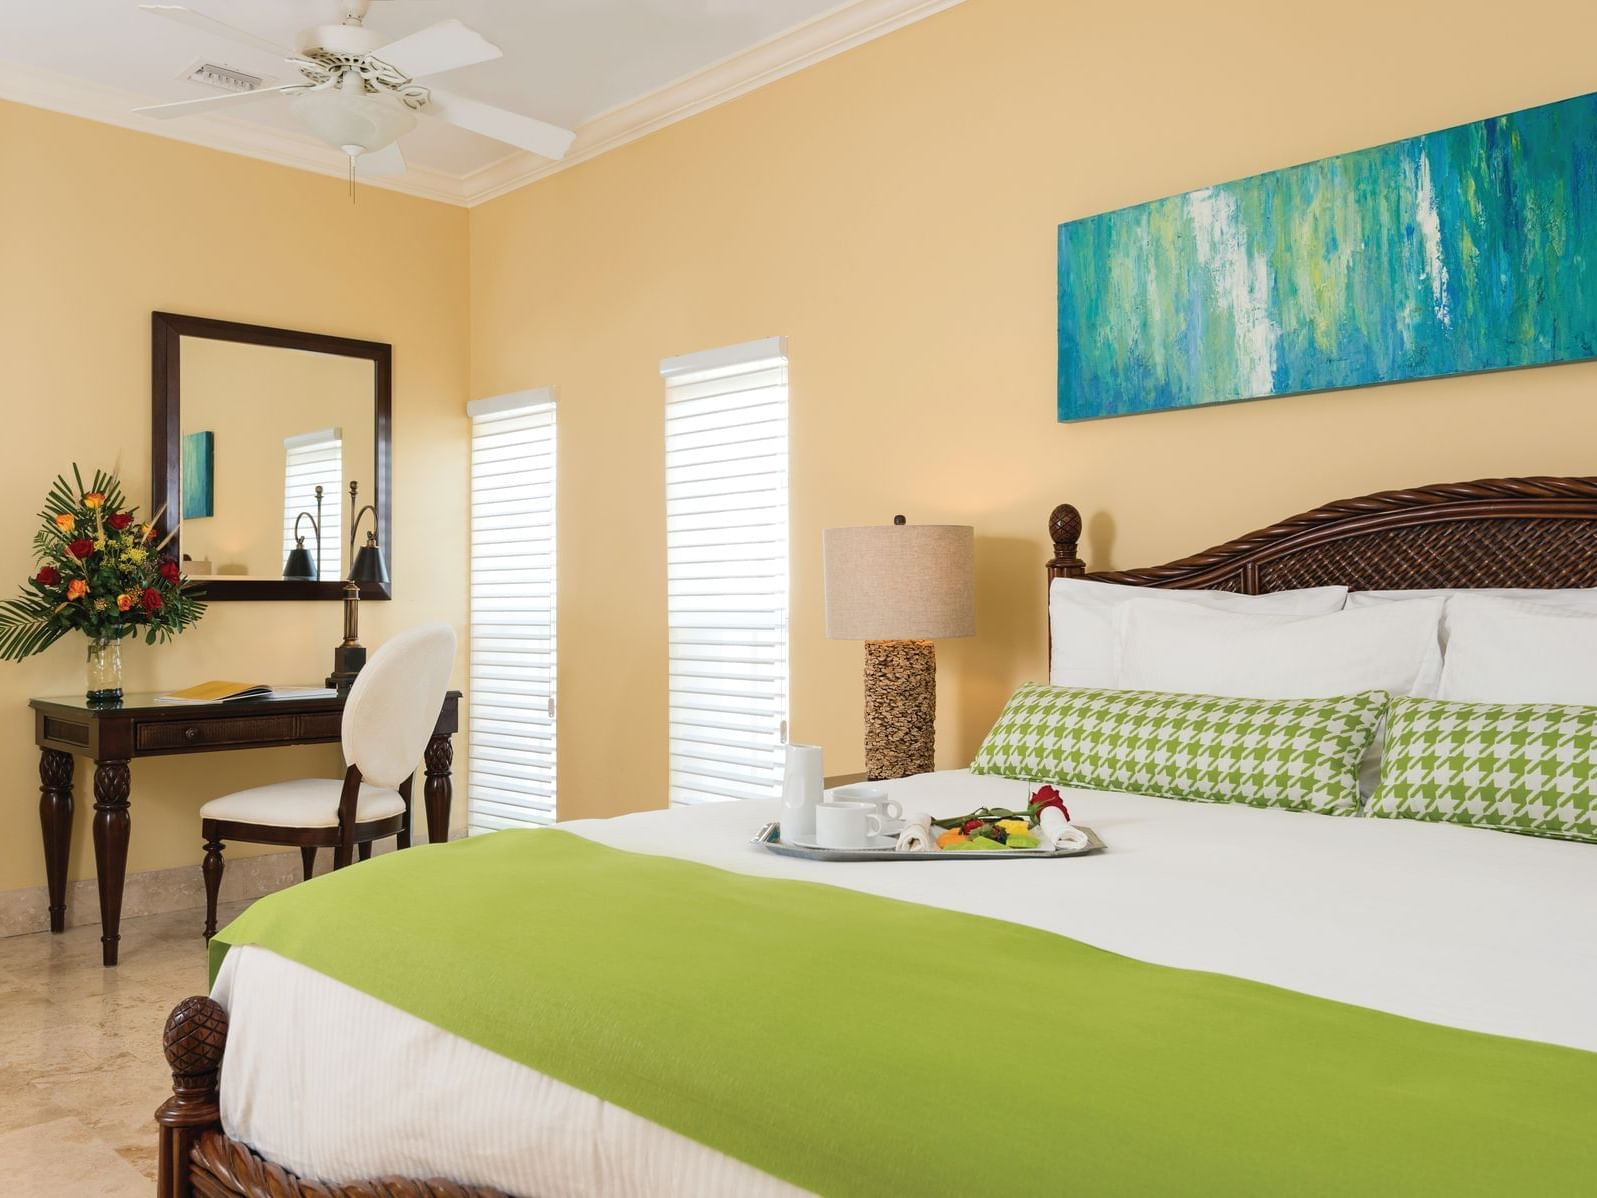 Bedroom of 1 Bedroom Junior Suite at Windsong Resort On The Reef